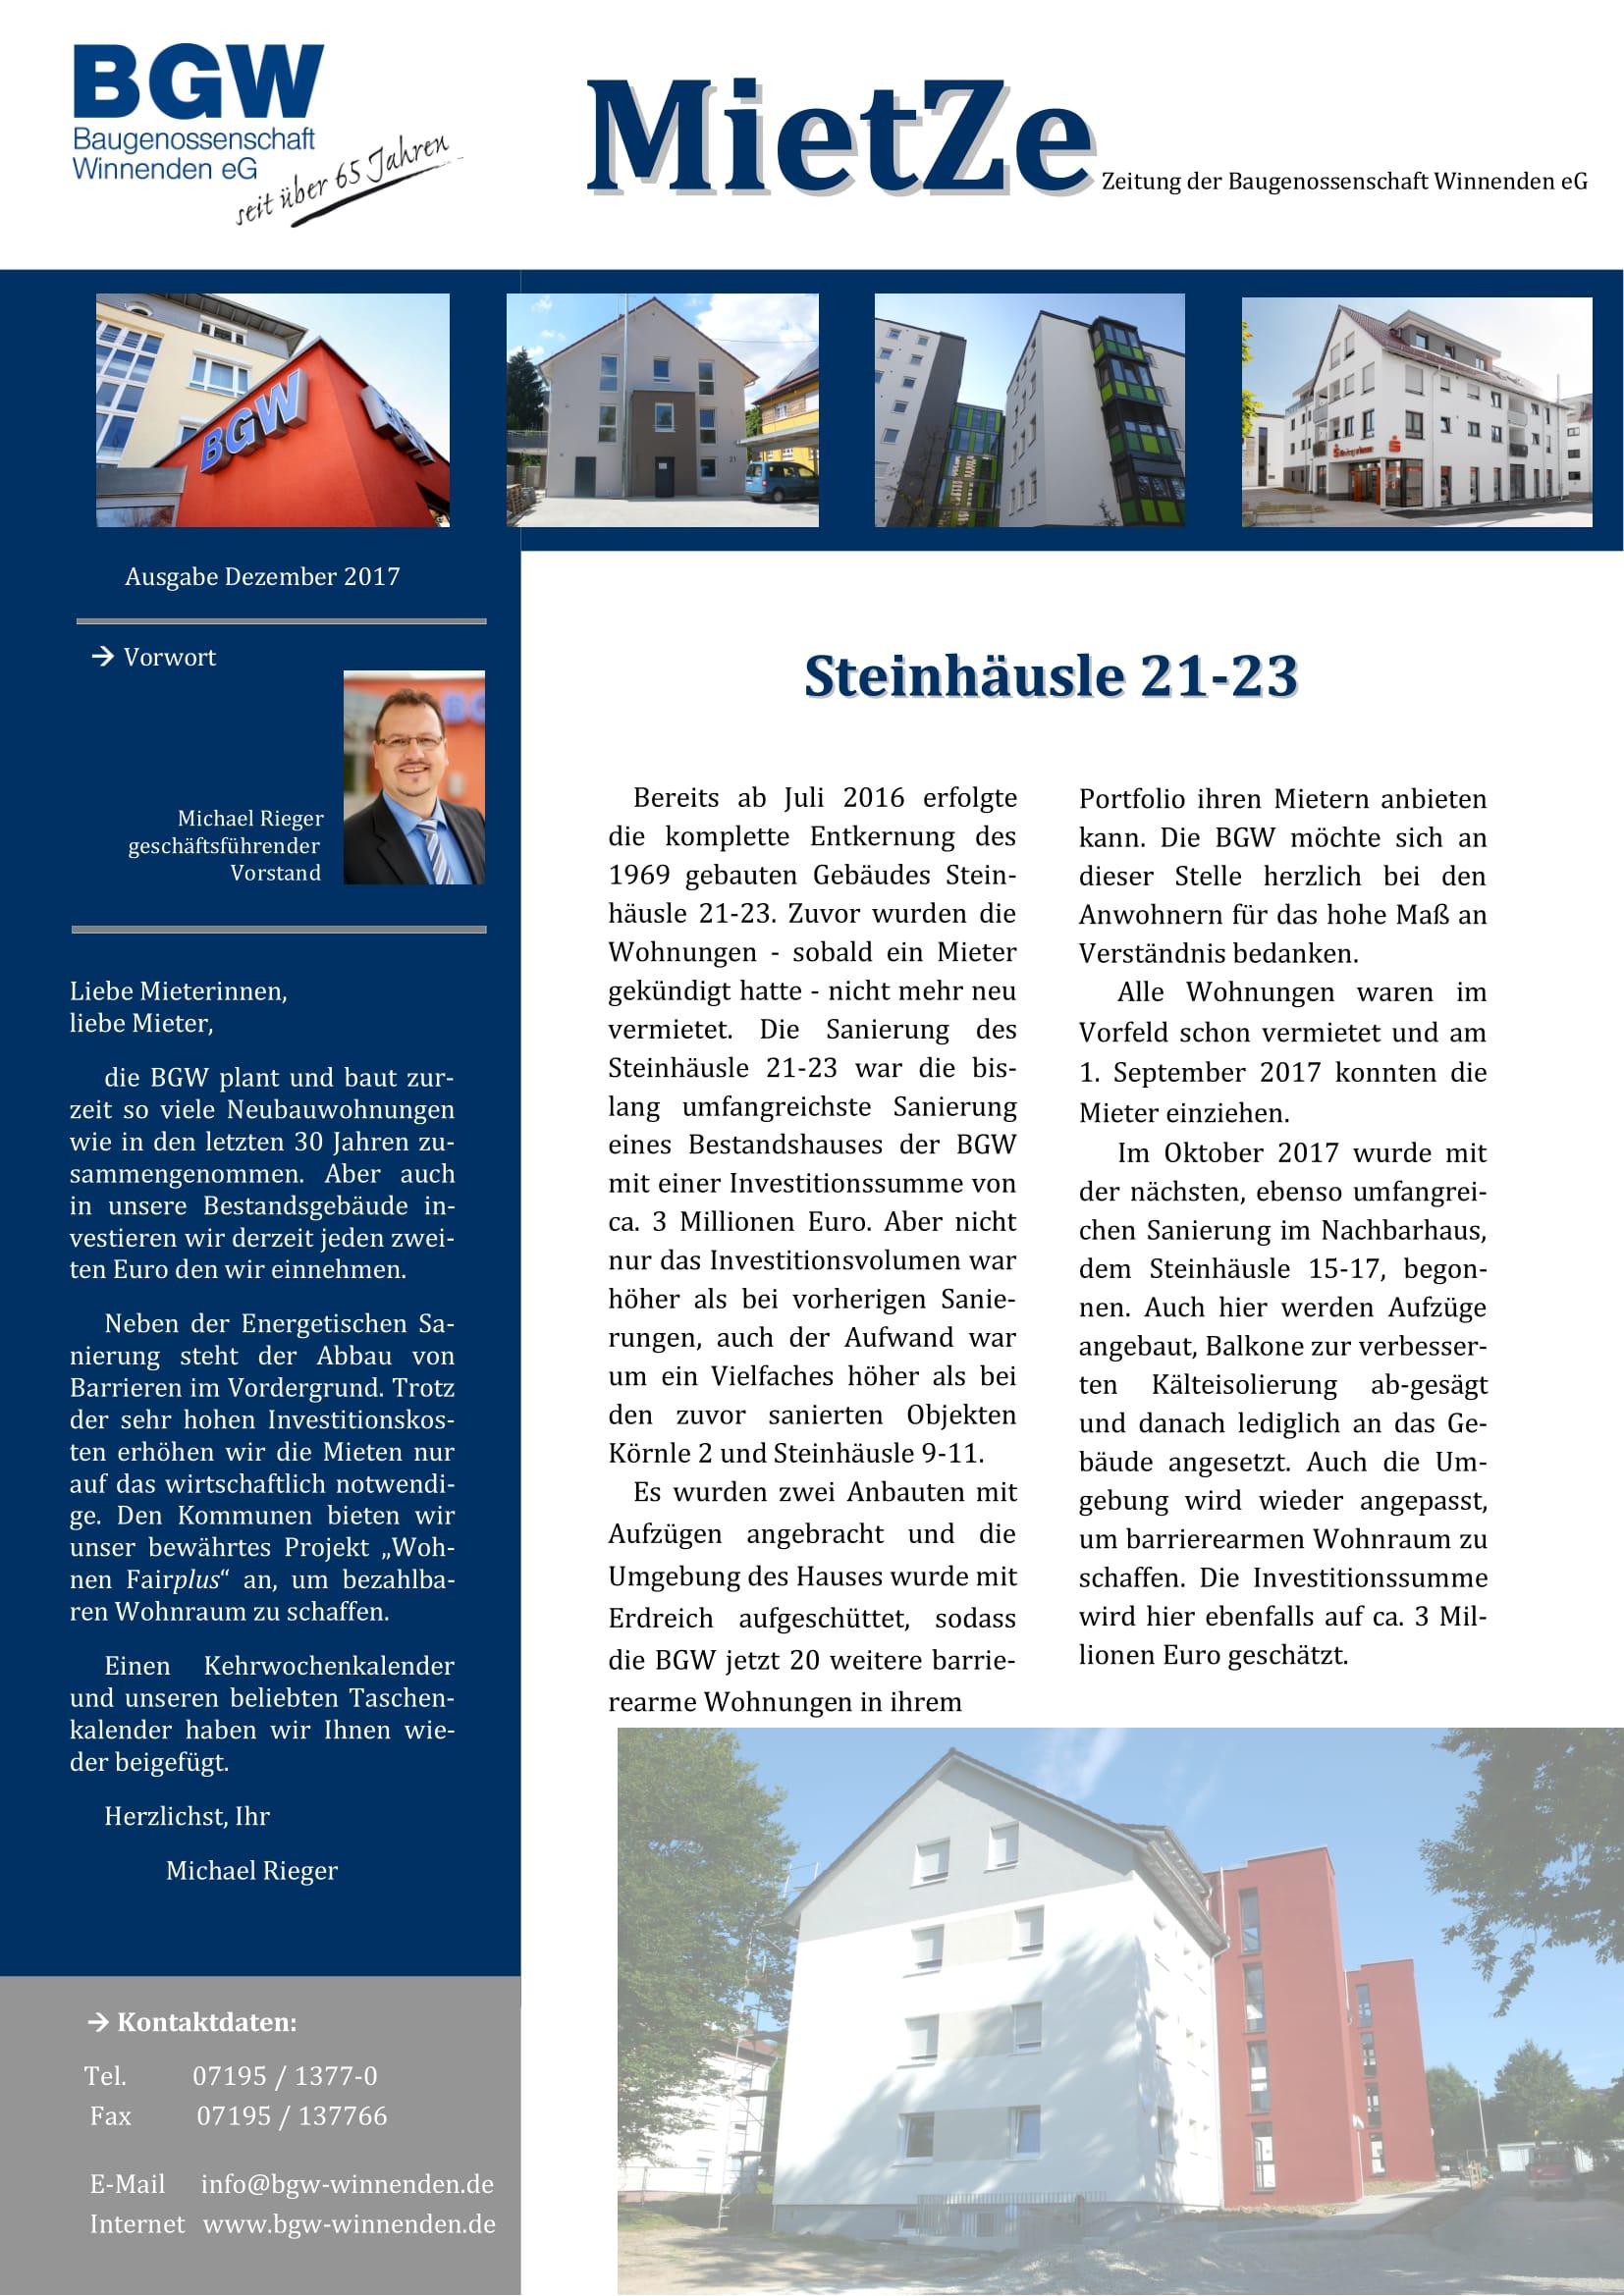 MietZe GROß 1 SCHWARZ 2 - Infos